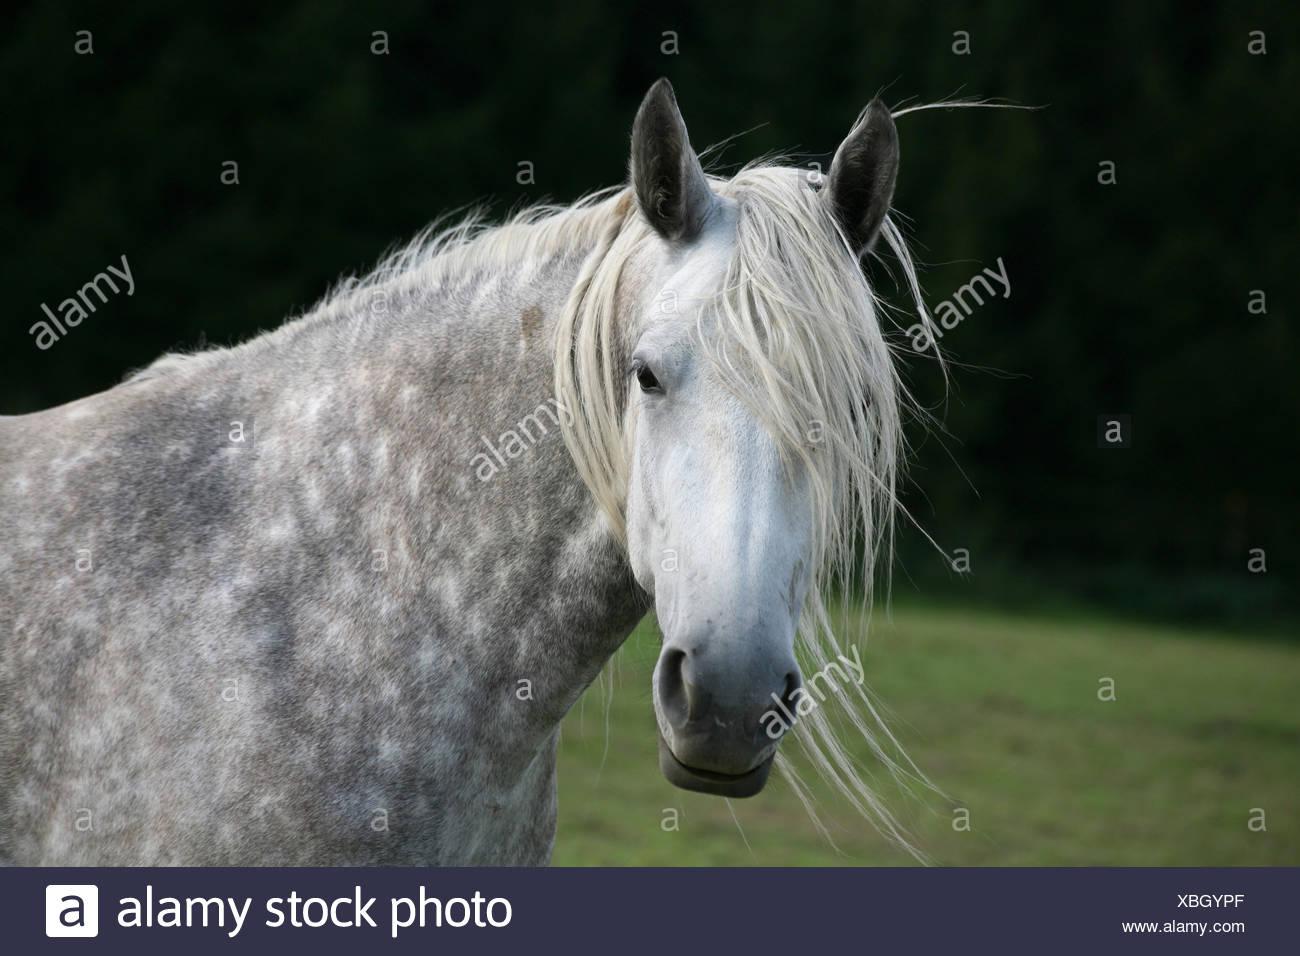 horse dapple grey thoroughbred - Stock Image